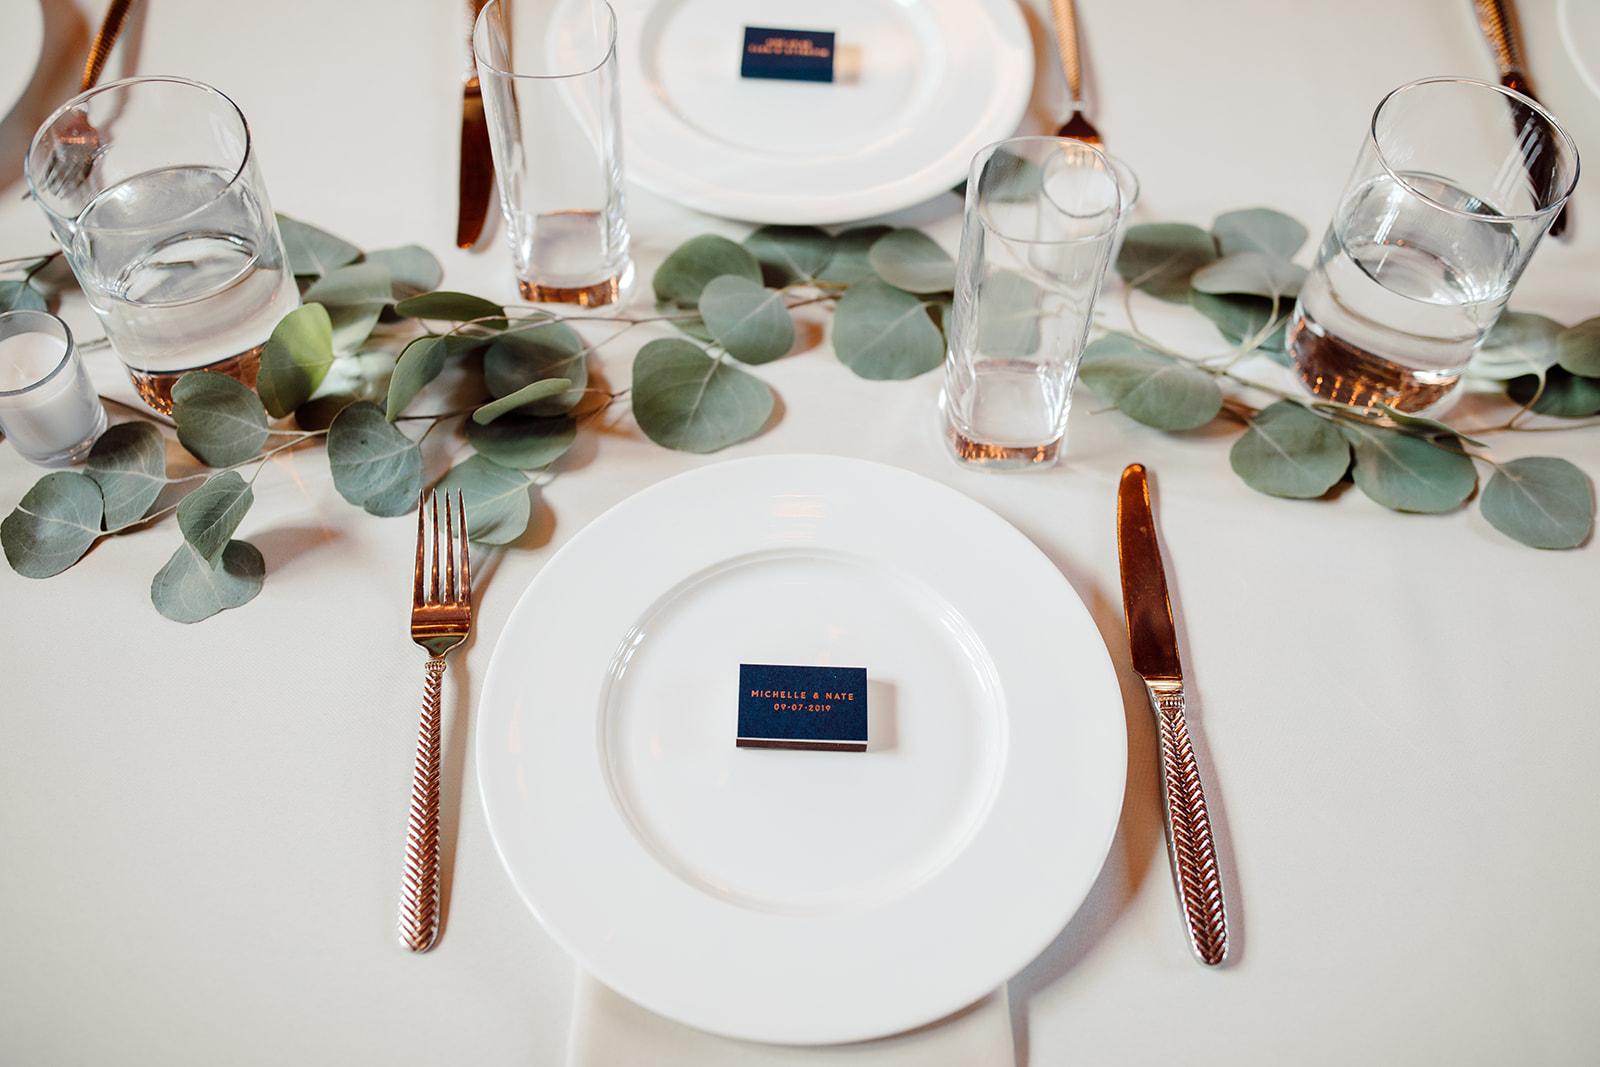 Minimalistic wedding table setting